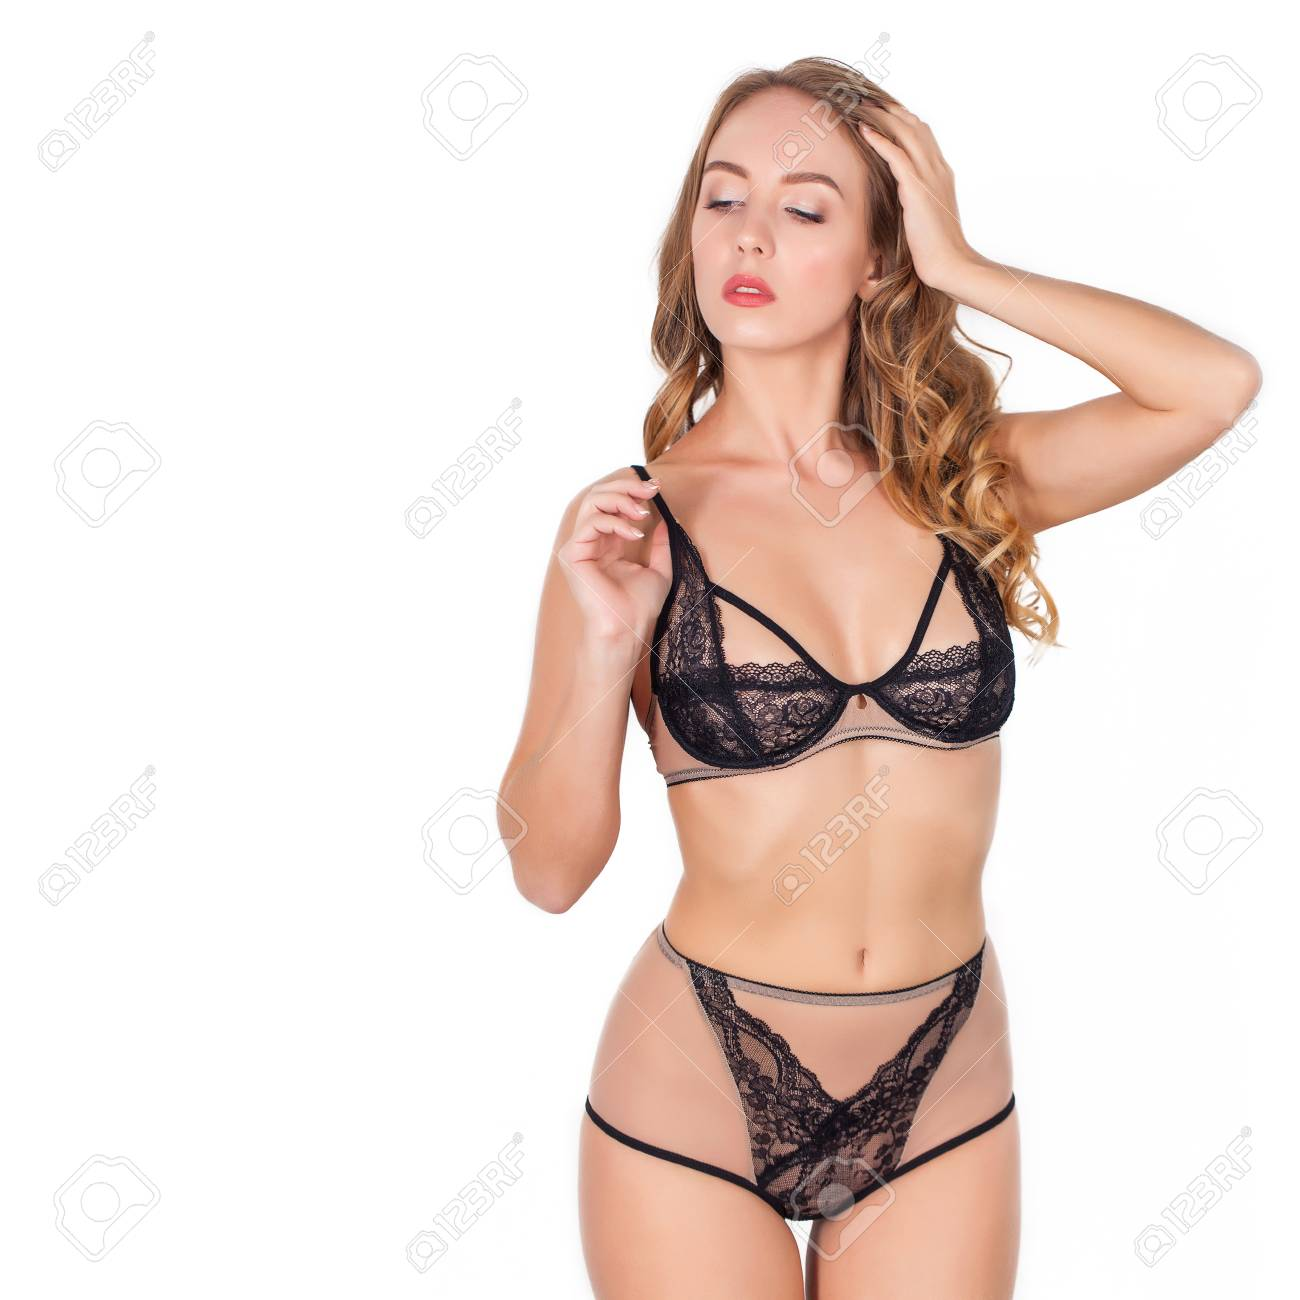 e7fba19eaf97 Hermosa mujer joven de fascinación en ropa interior sexy aisladas sobre  fondo blanco